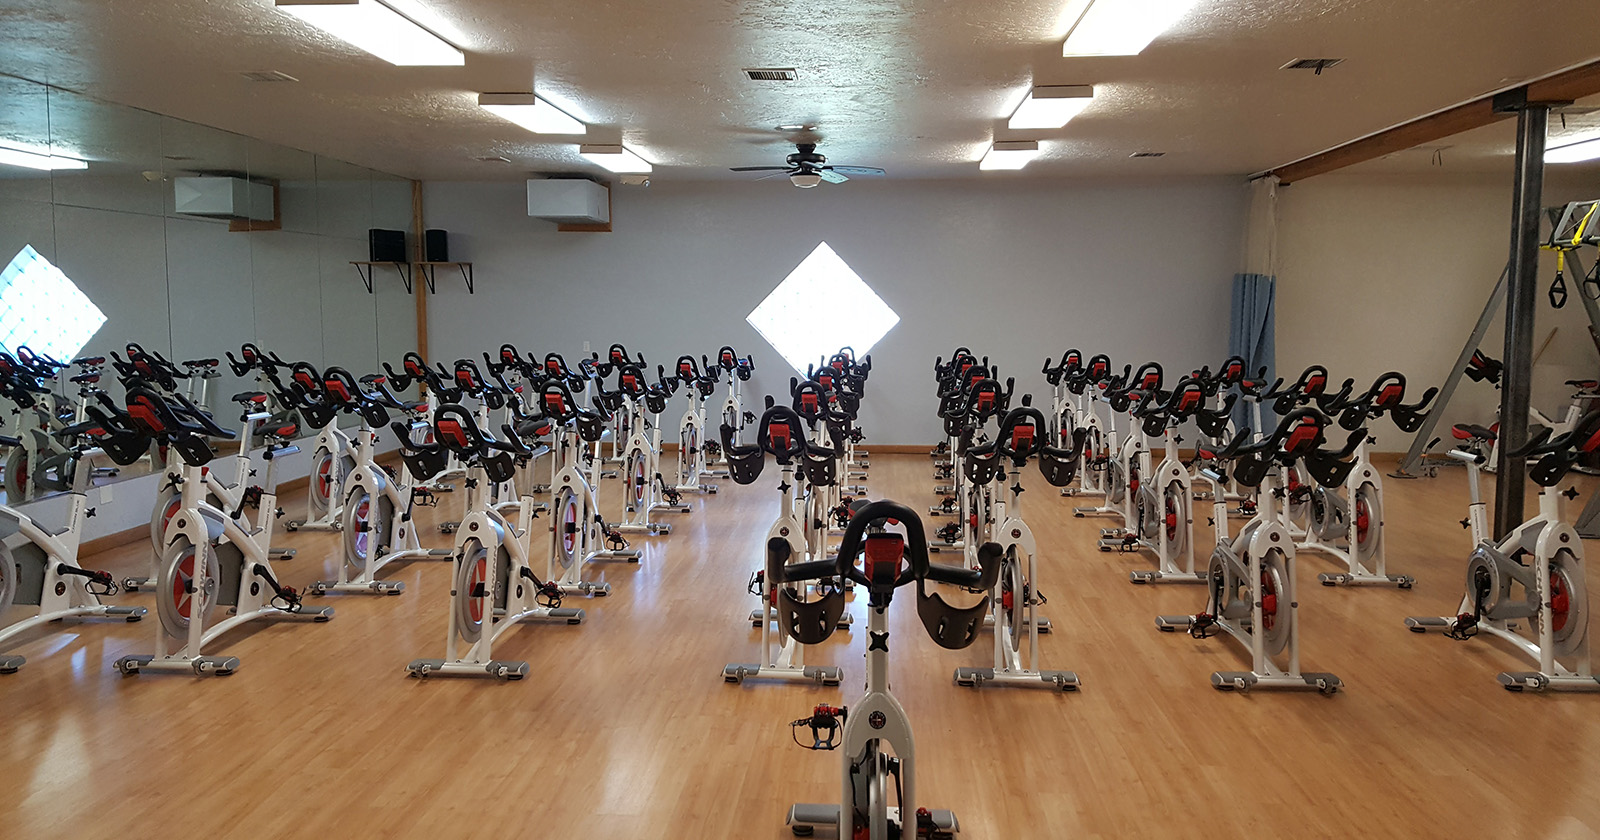 Flagstaff Health Club | Fitness & Wellness Facility in Arizona